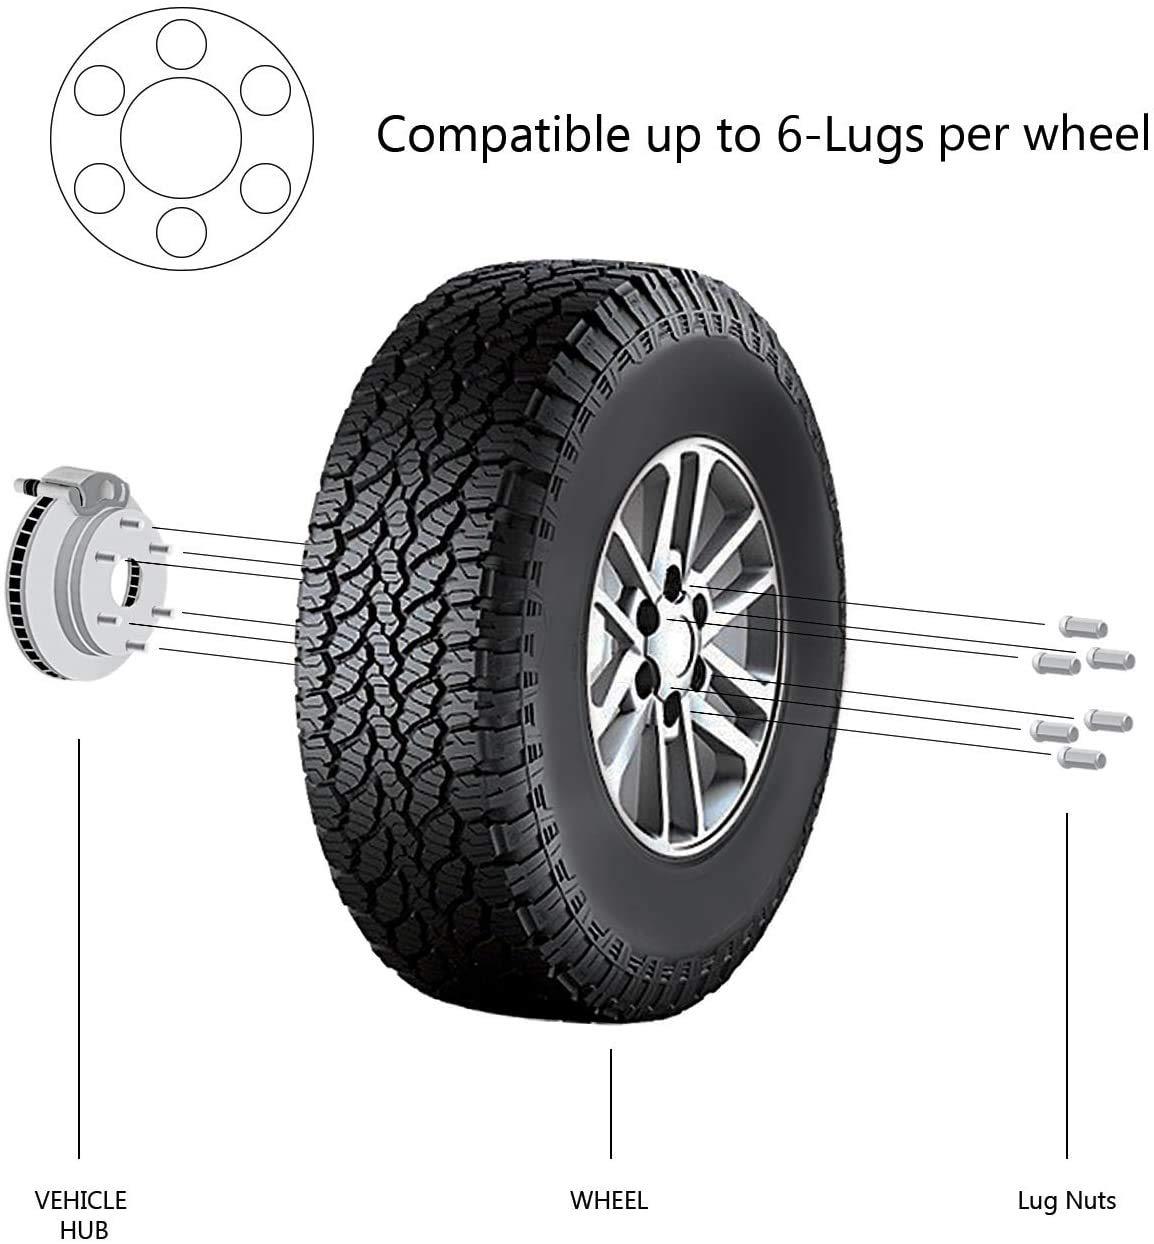 24 pcs Chrome Bulge Acorn Wheel Lug Nuts 1//2-20 Closed End 1.9 XL Tall 3//4 Hex TC Sportline WH-LN12UN190CH24